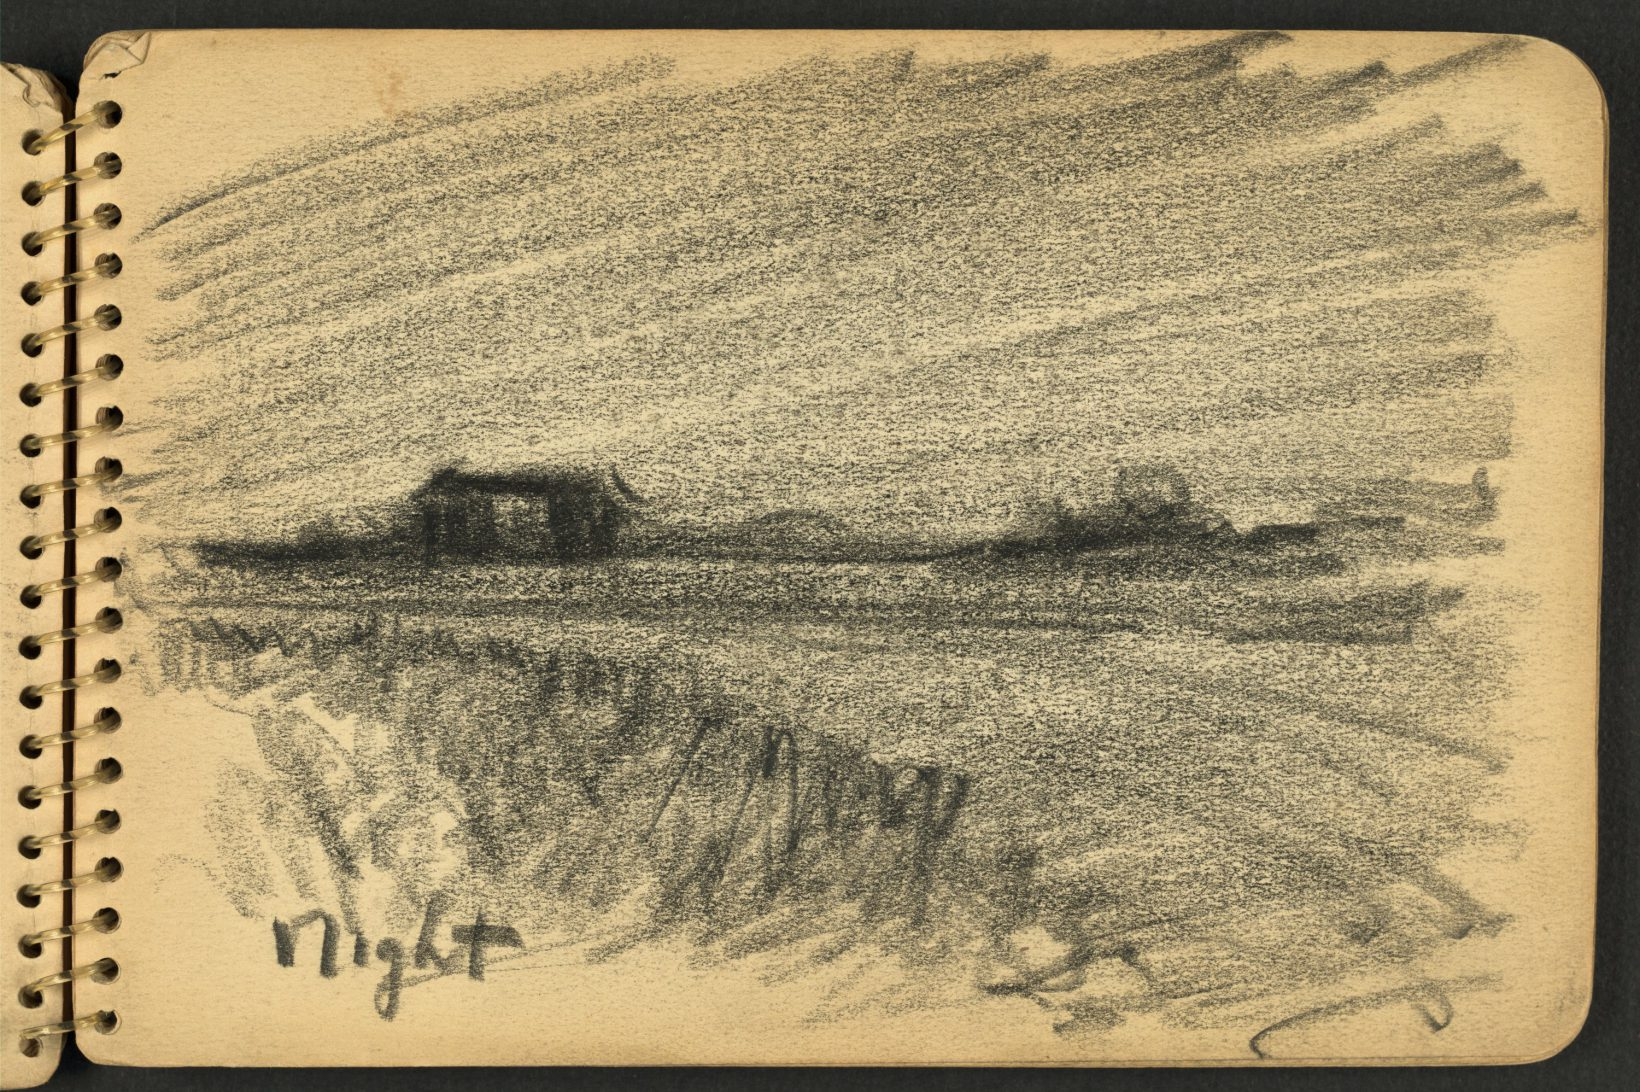 victor-lundy-carnet-croquis-seconde-guerre-mondiale-11